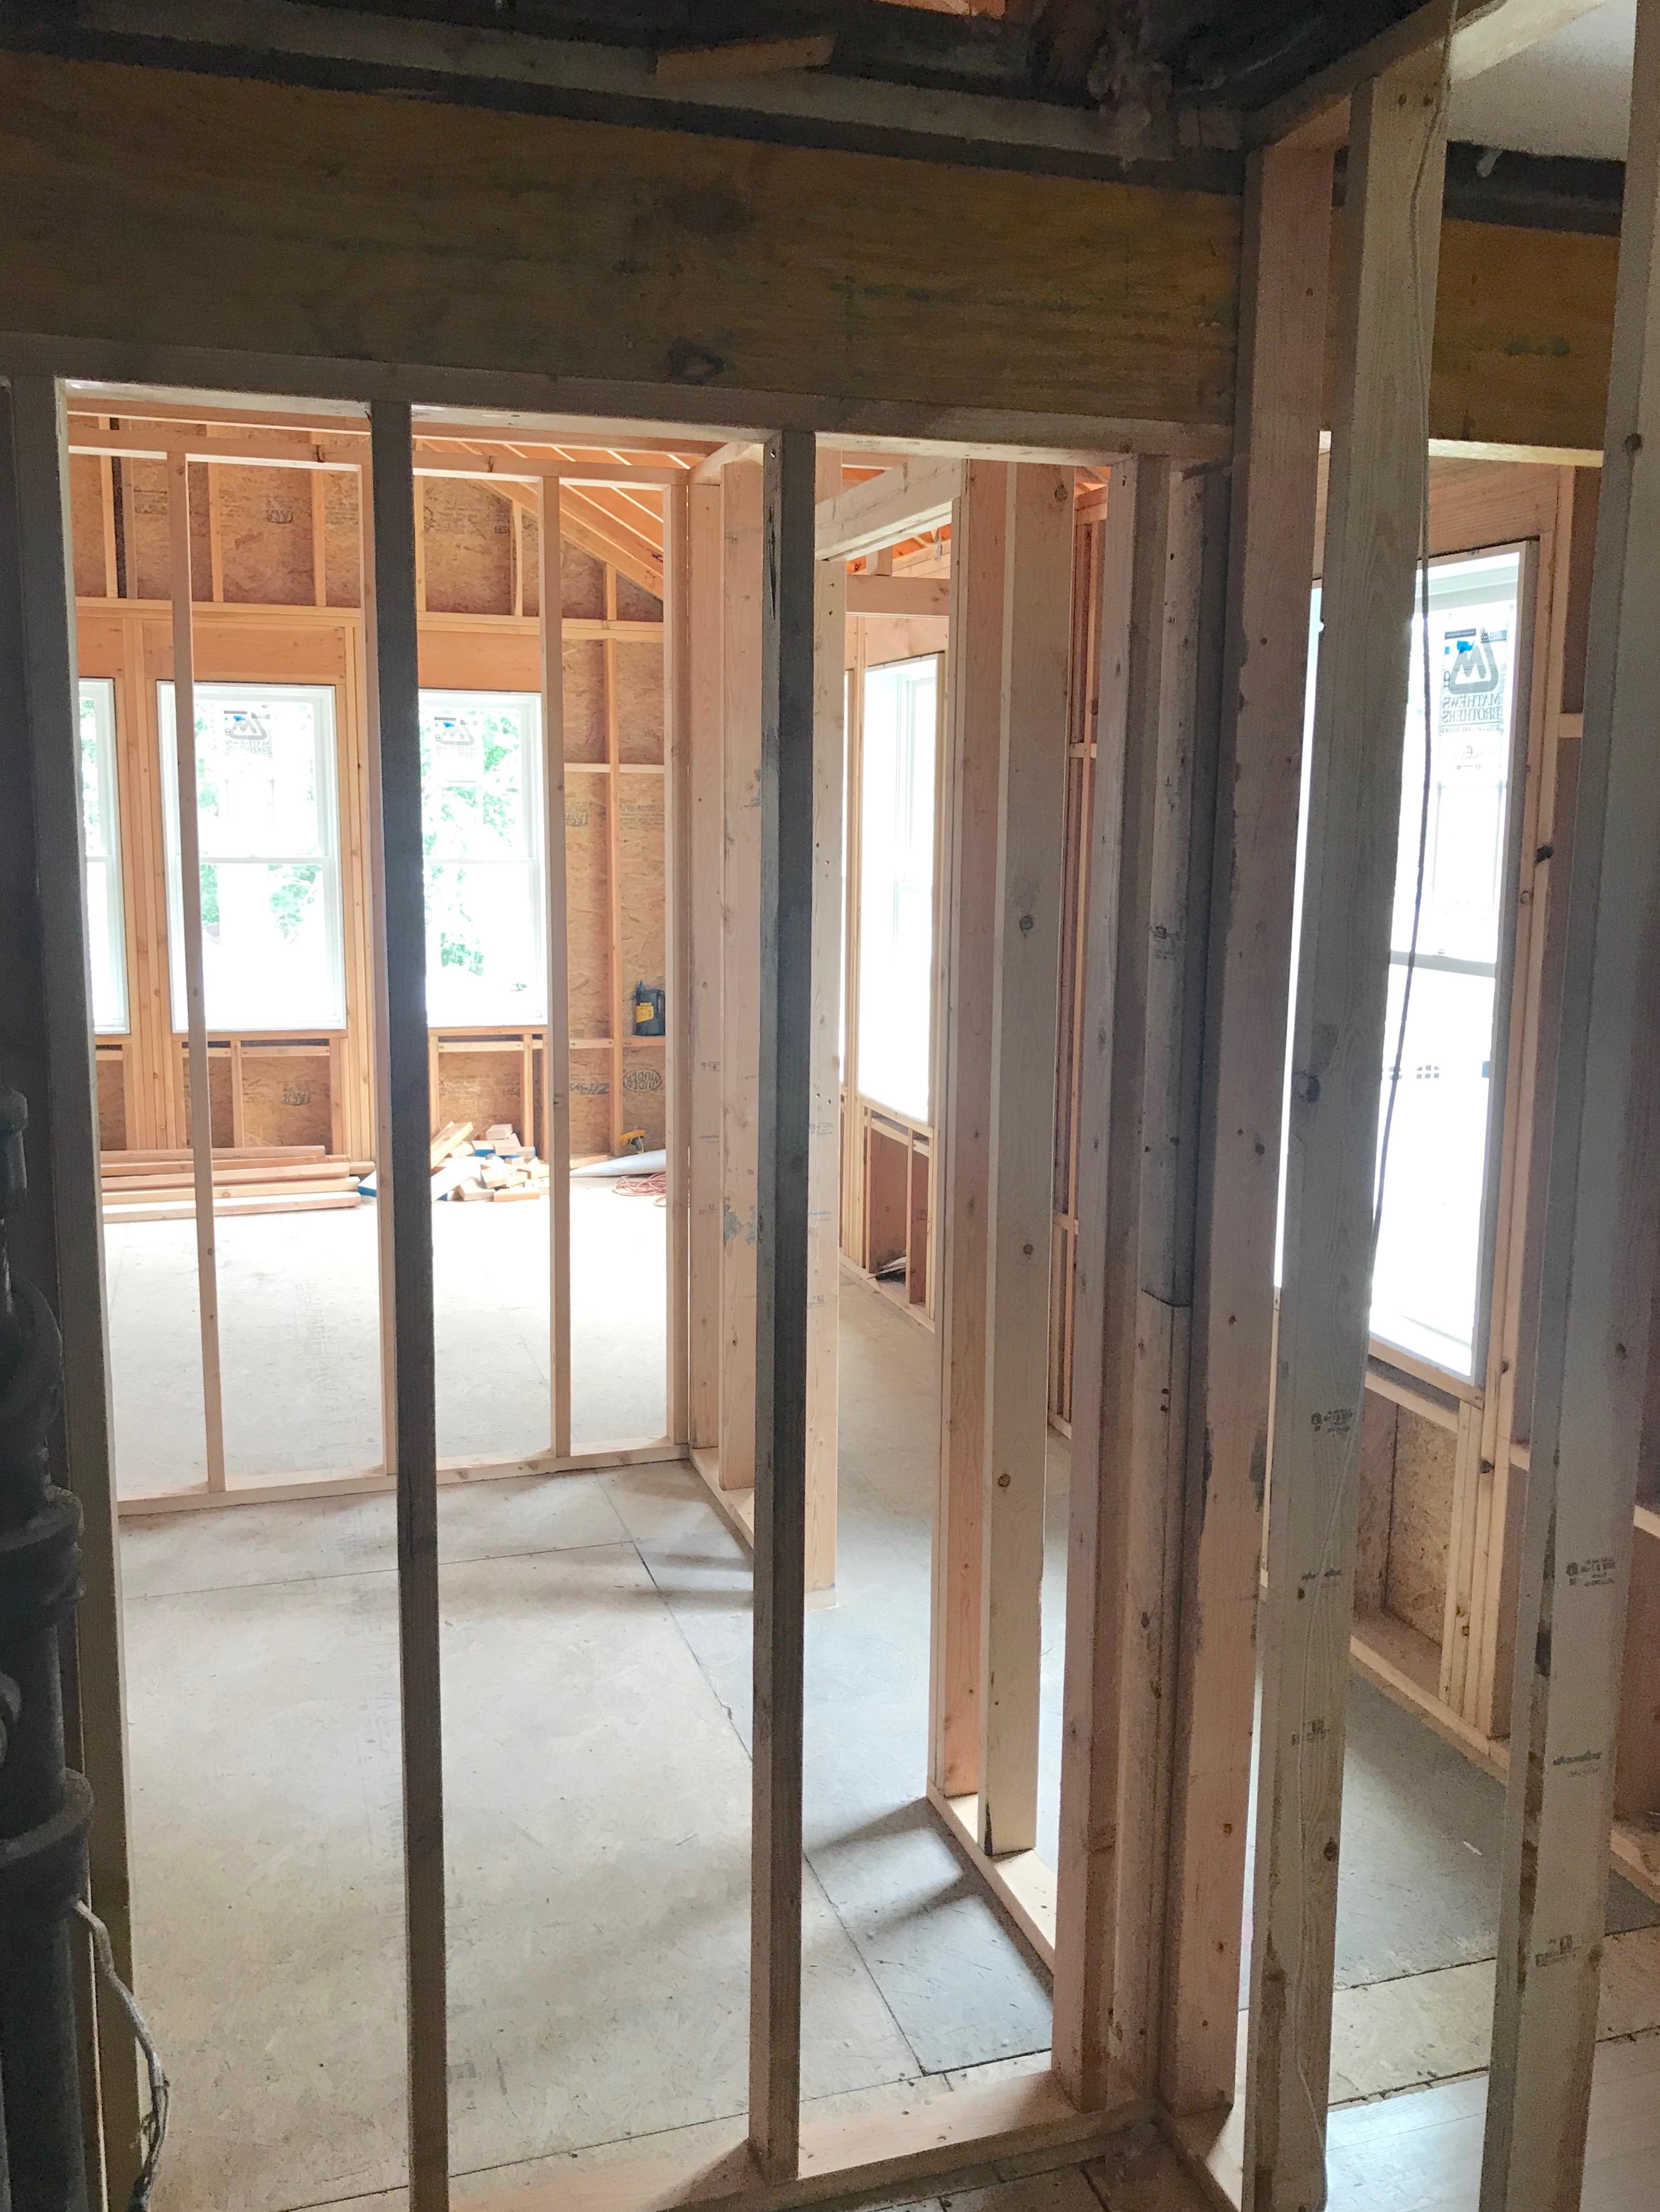 Small Full Bathroom Inpsiration - framing a new kid bathroom on Pinteresting Plans Blog